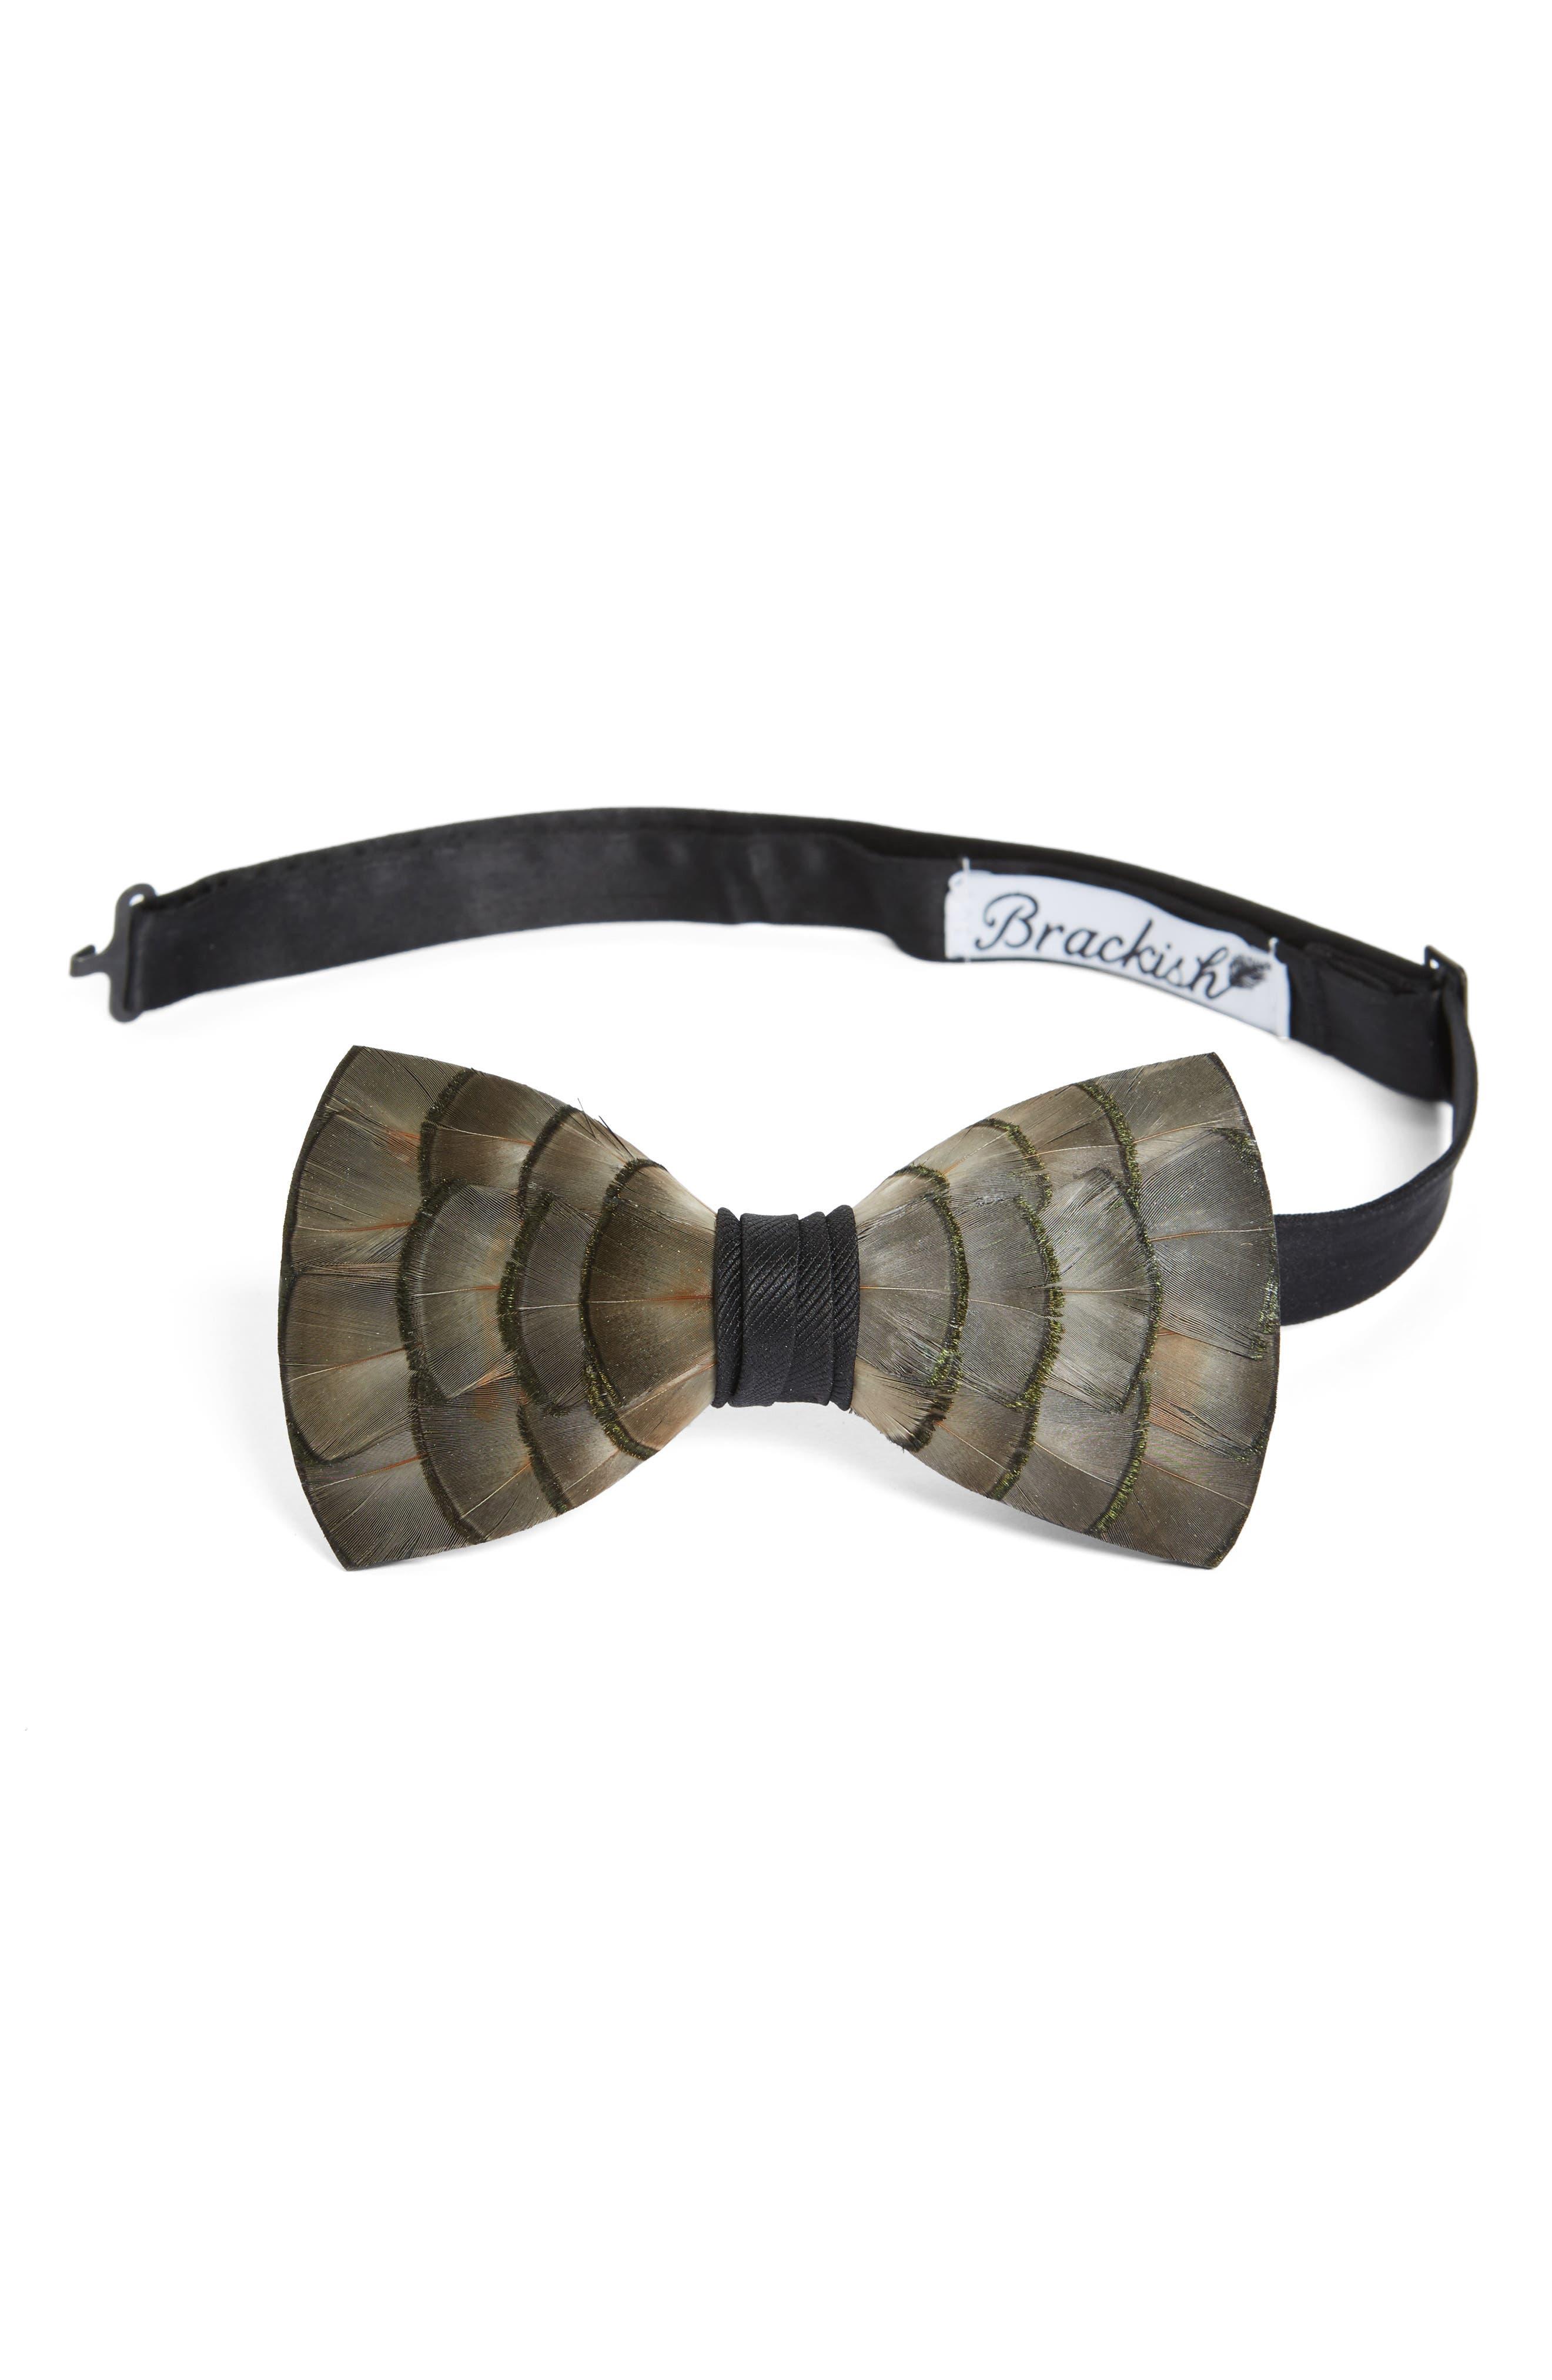 Brackish & Bell Lynx Feather Bow Tie